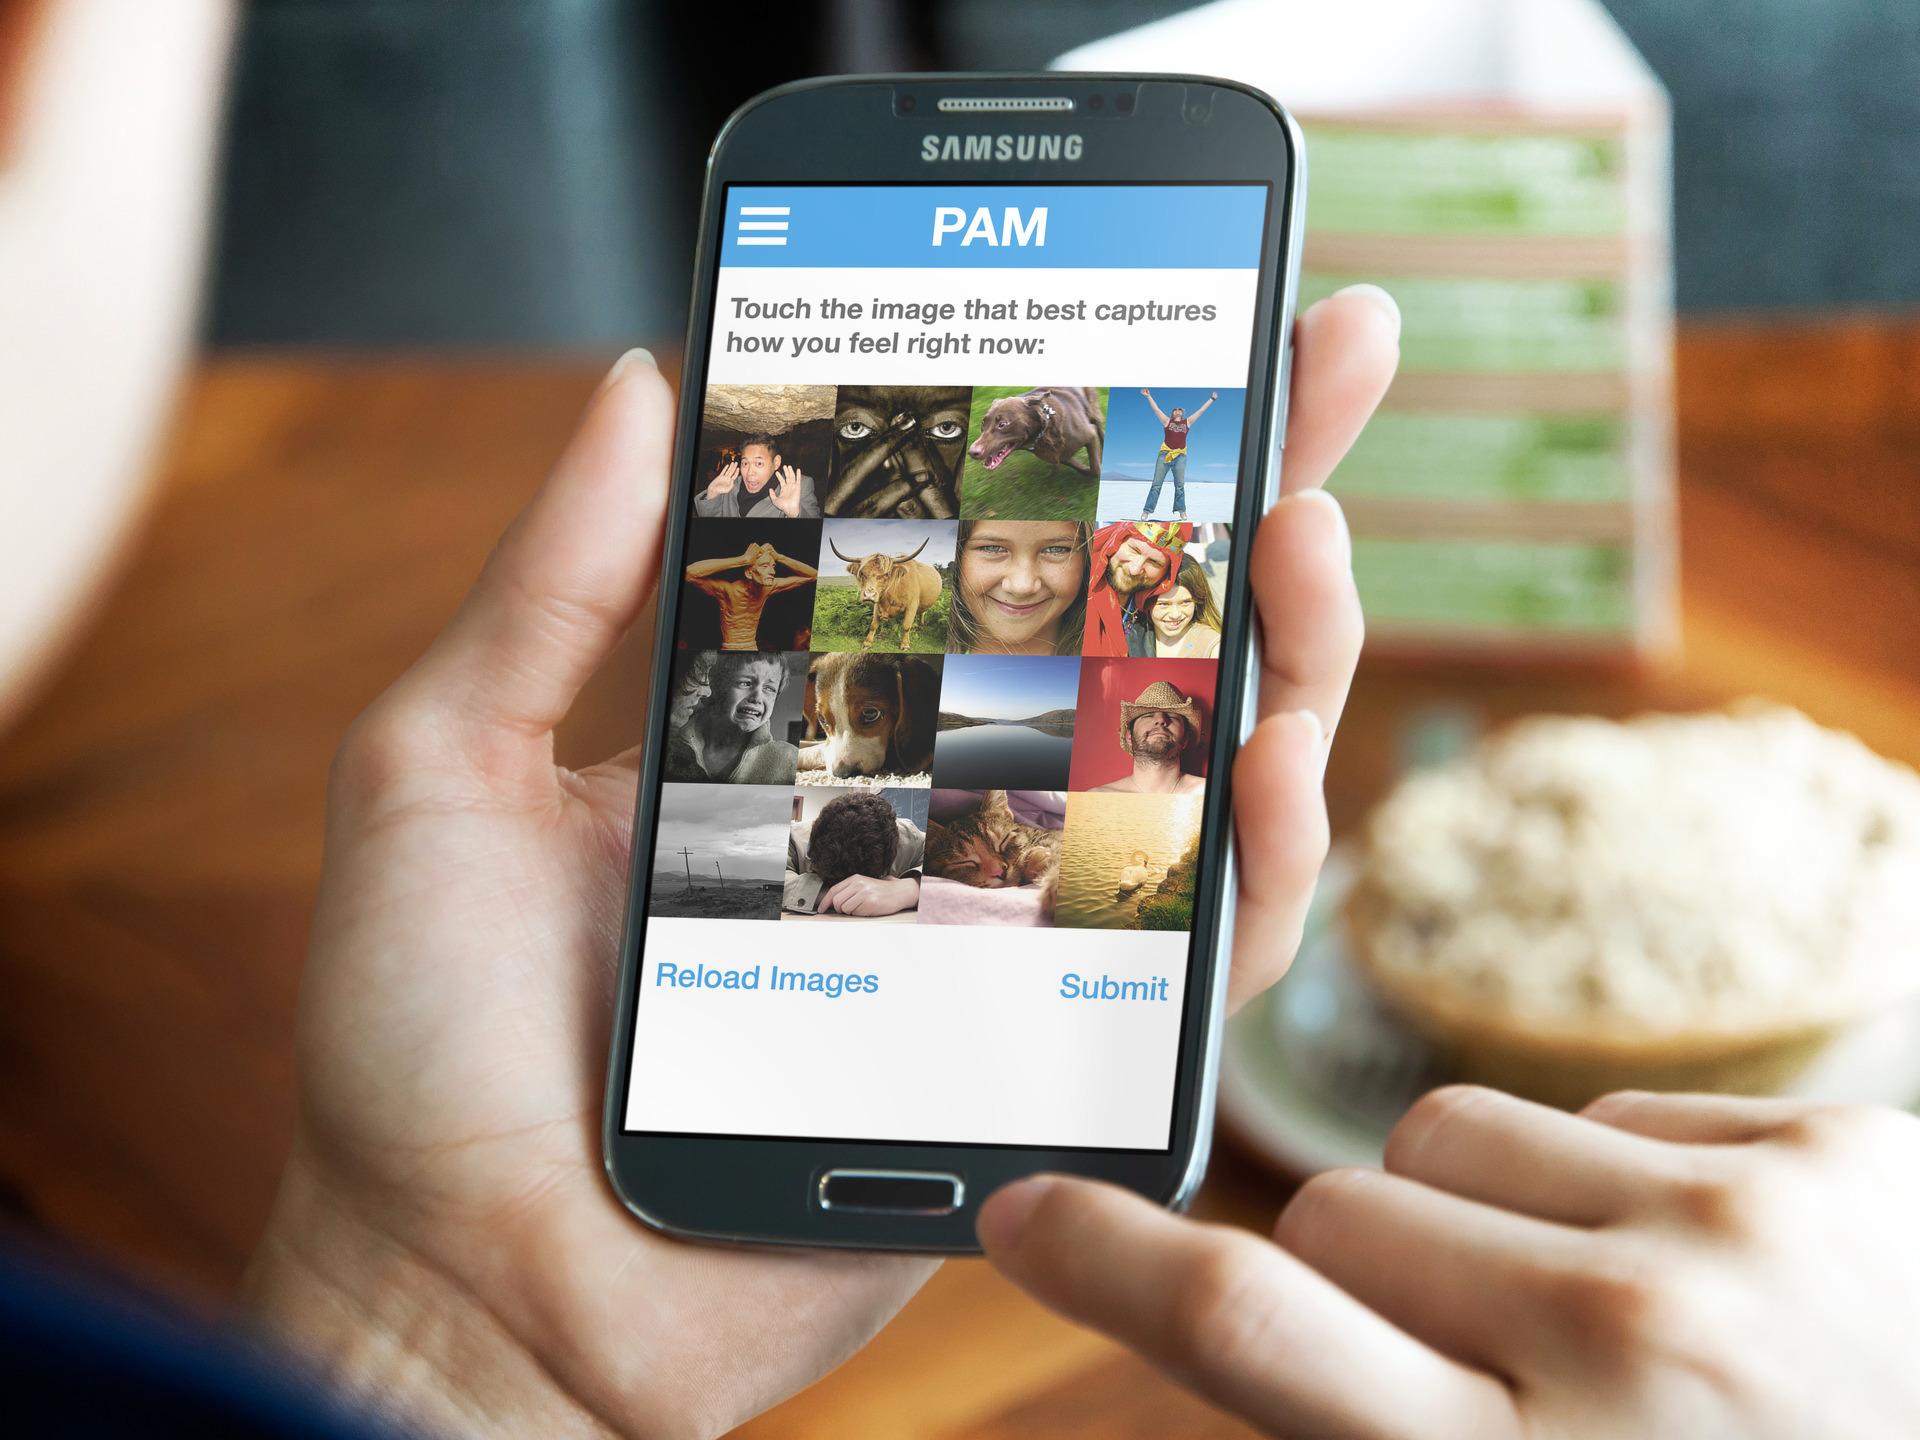 PAM_in_hand.jpg